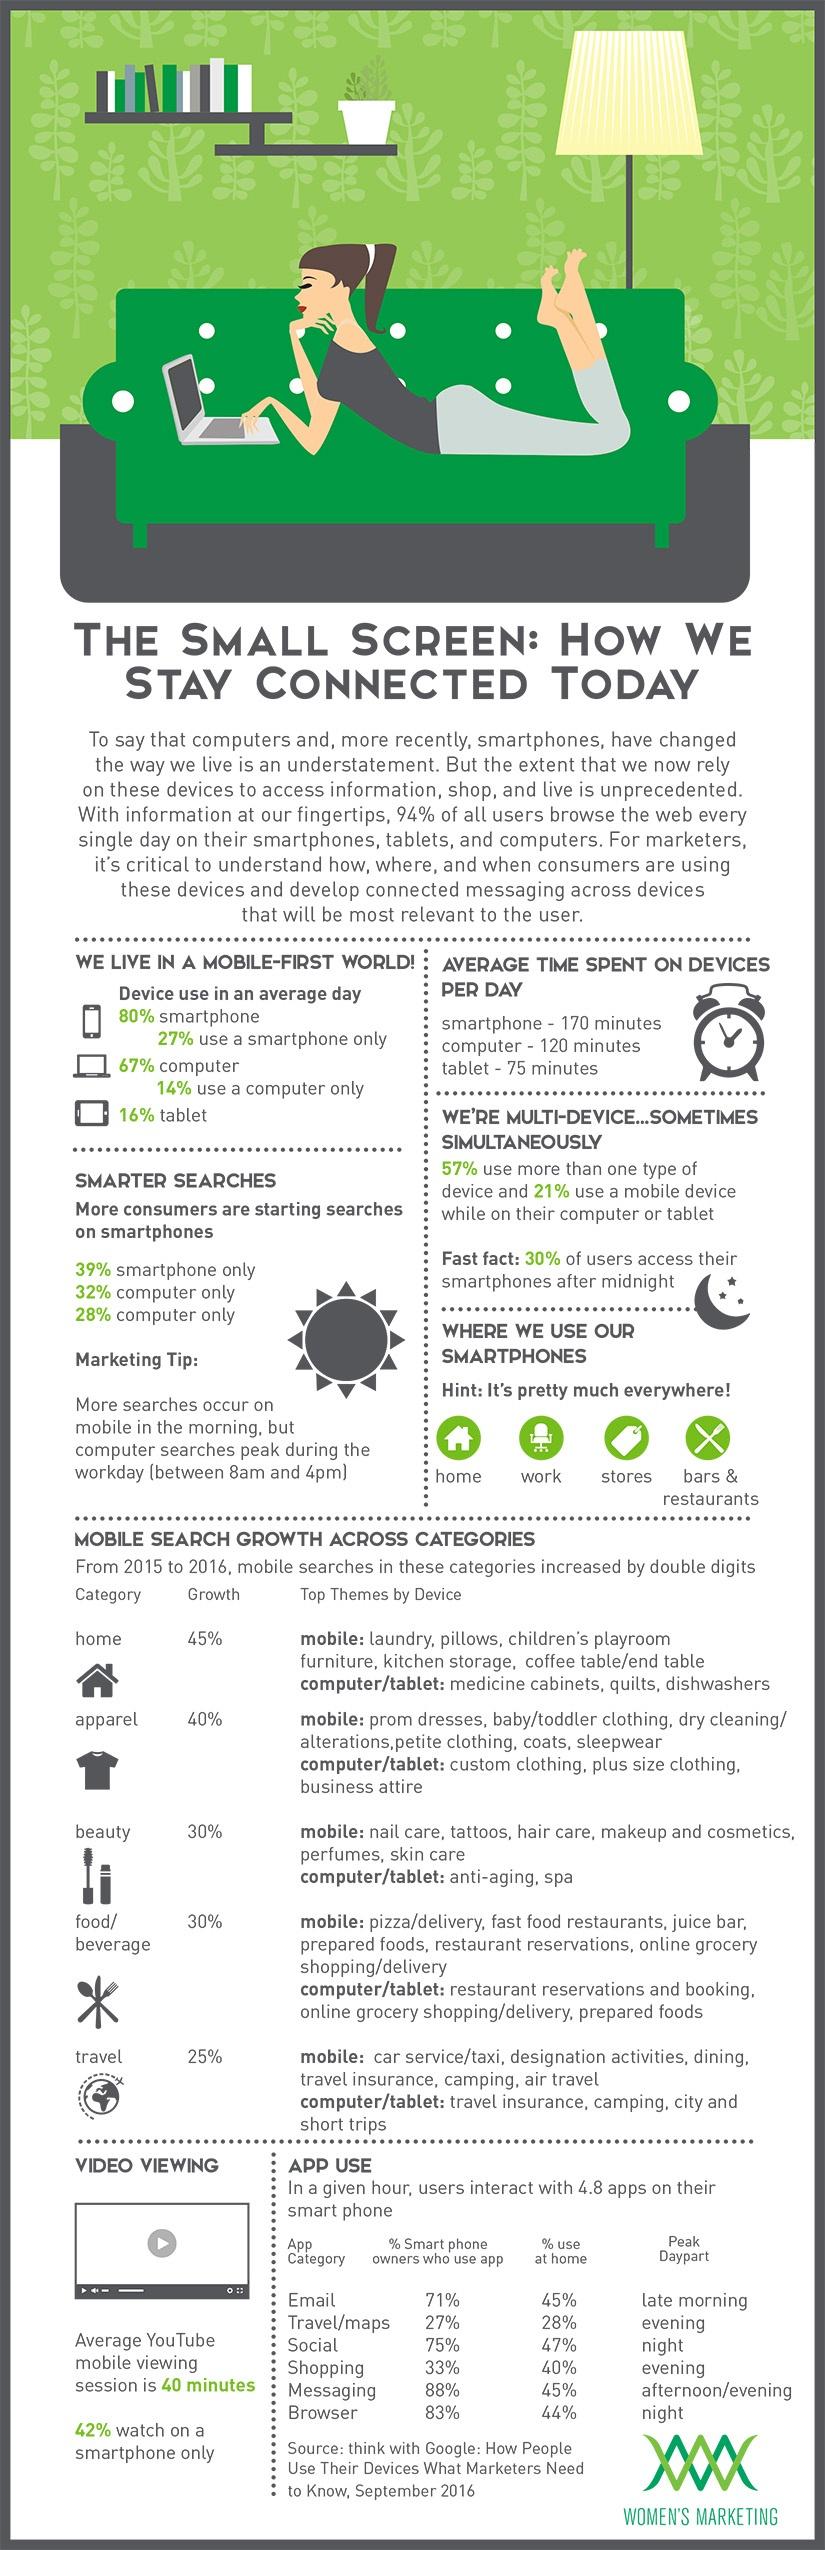 SmallScreenHowWeStayConnected_Infographic.jpg